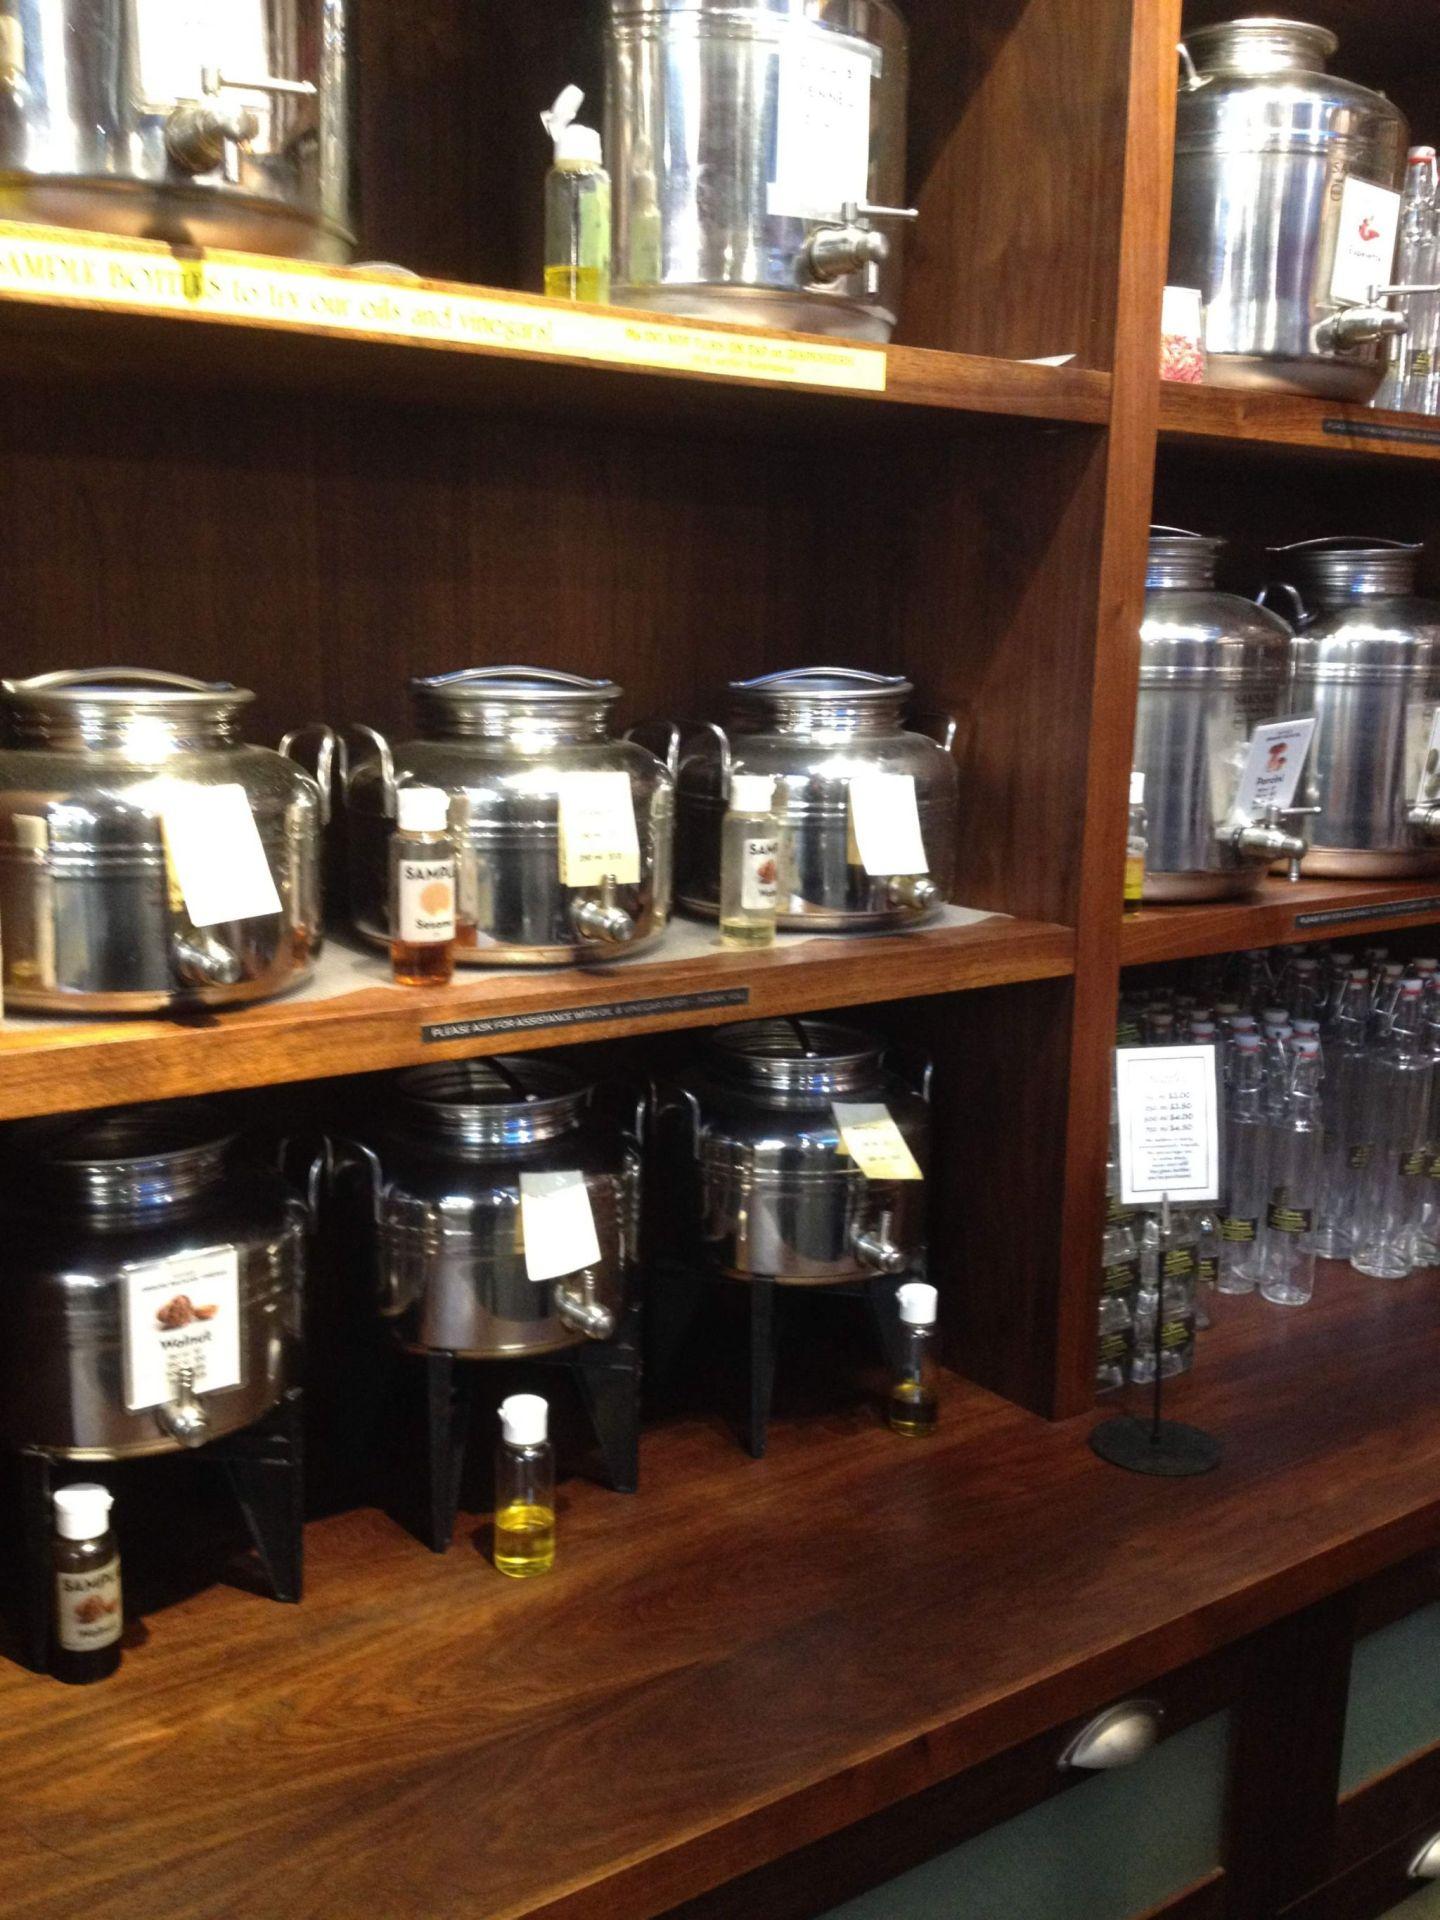 Tea from Granville Island Public Market, Vancouver